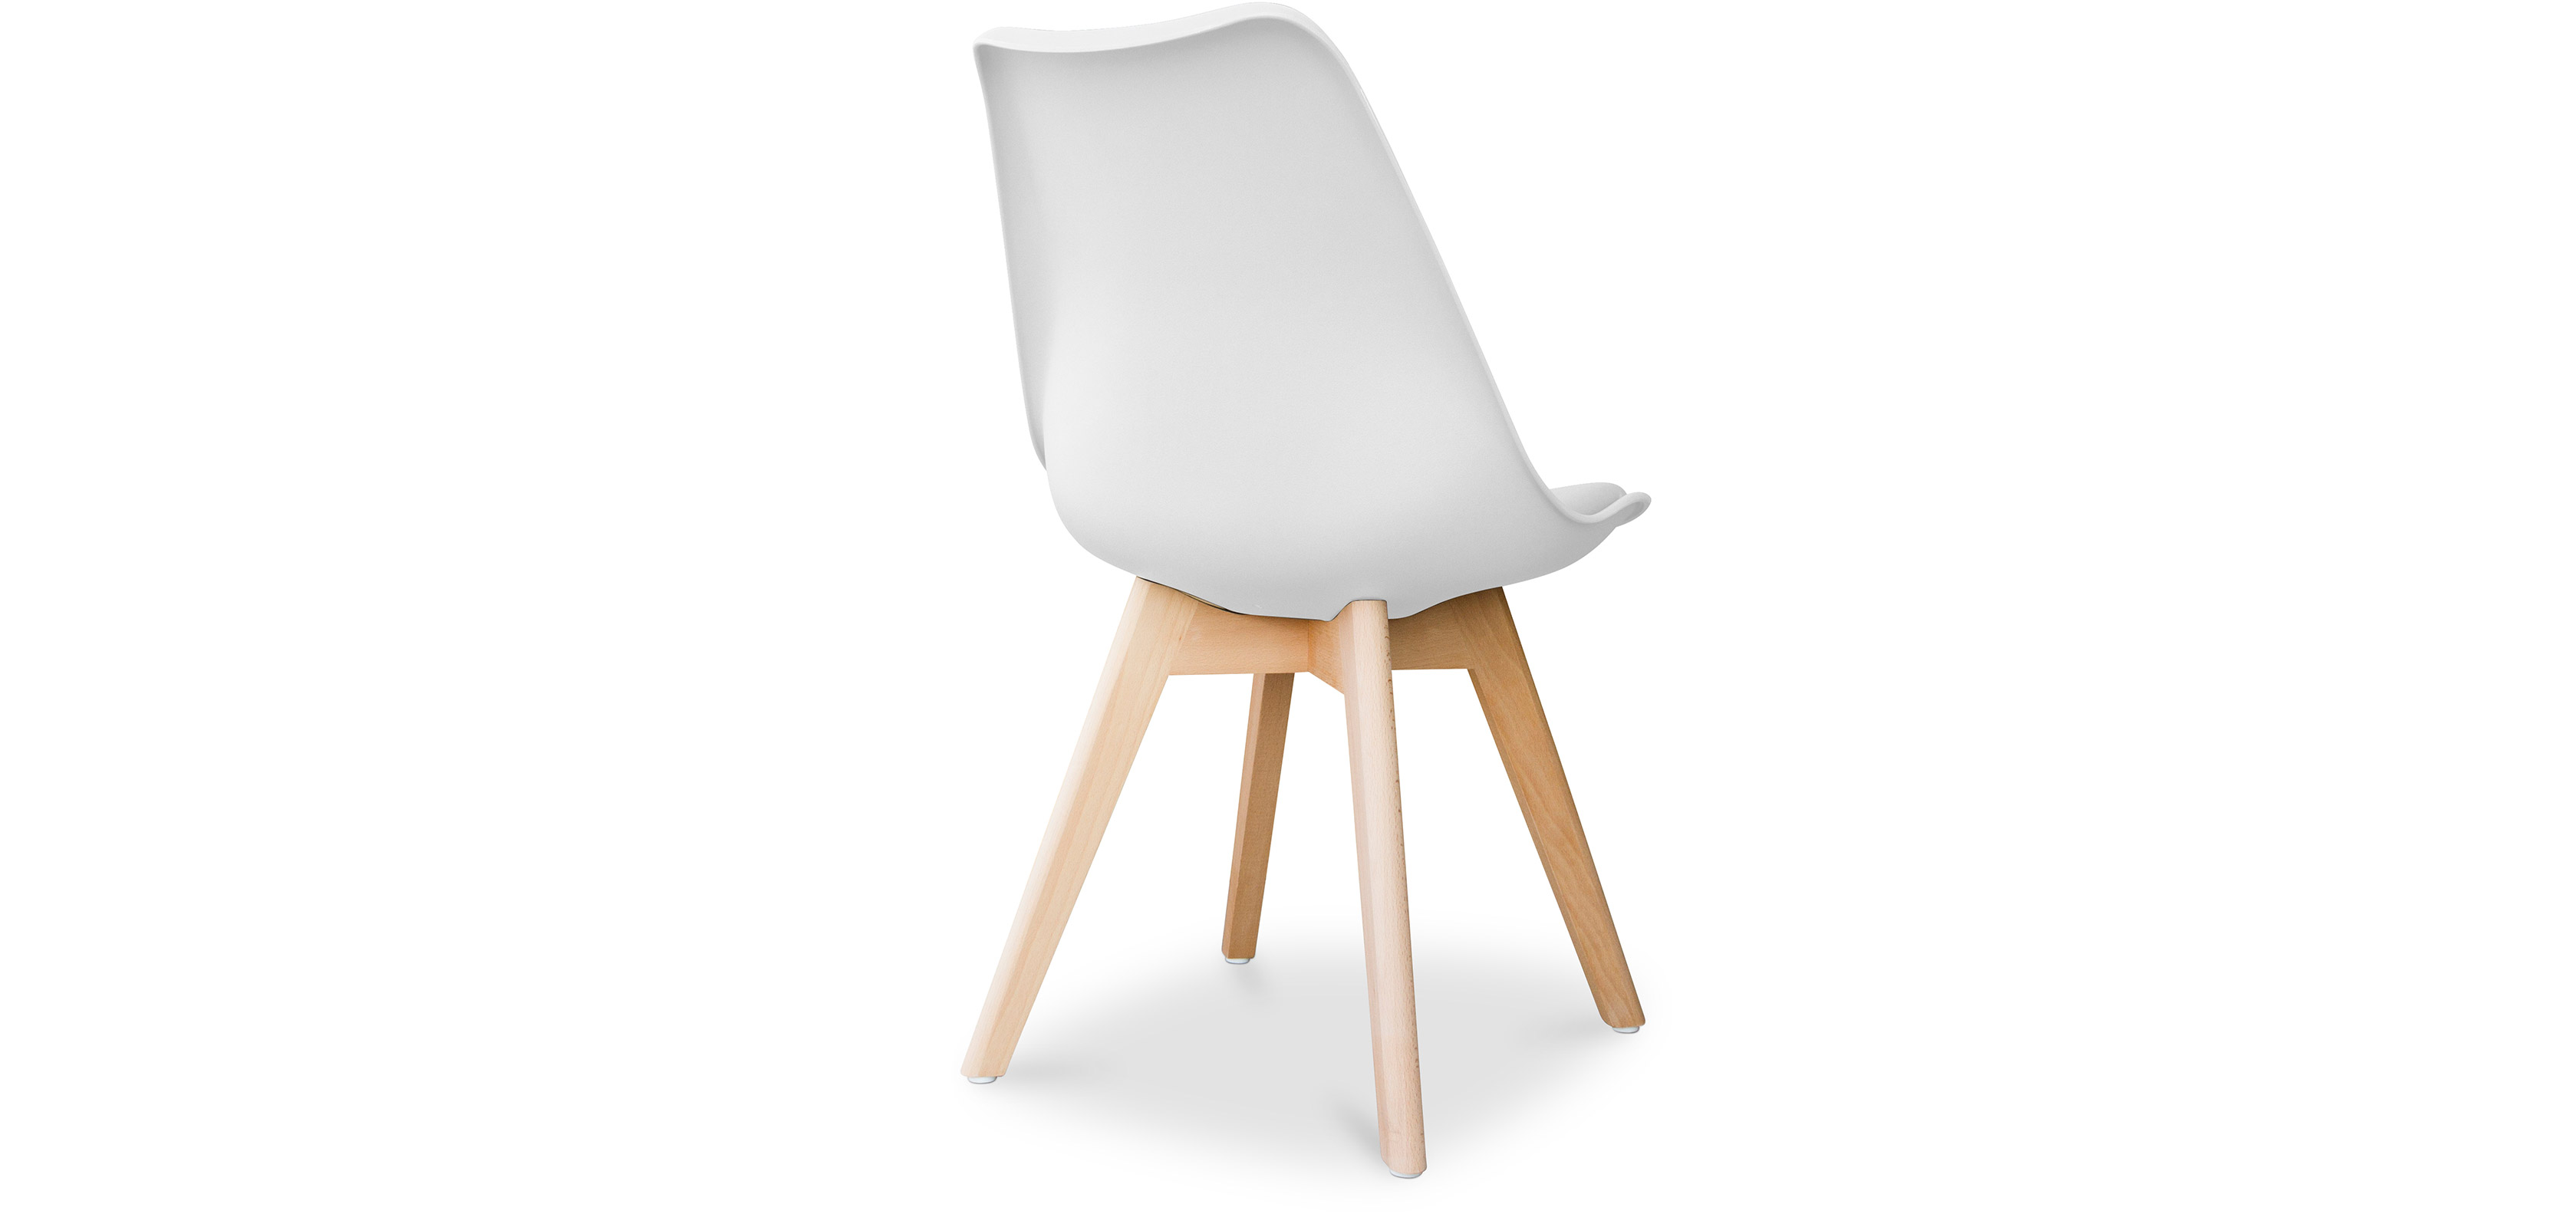 chaise dsw avec coussin design scandinave charles eames. Black Bedroom Furniture Sets. Home Design Ideas